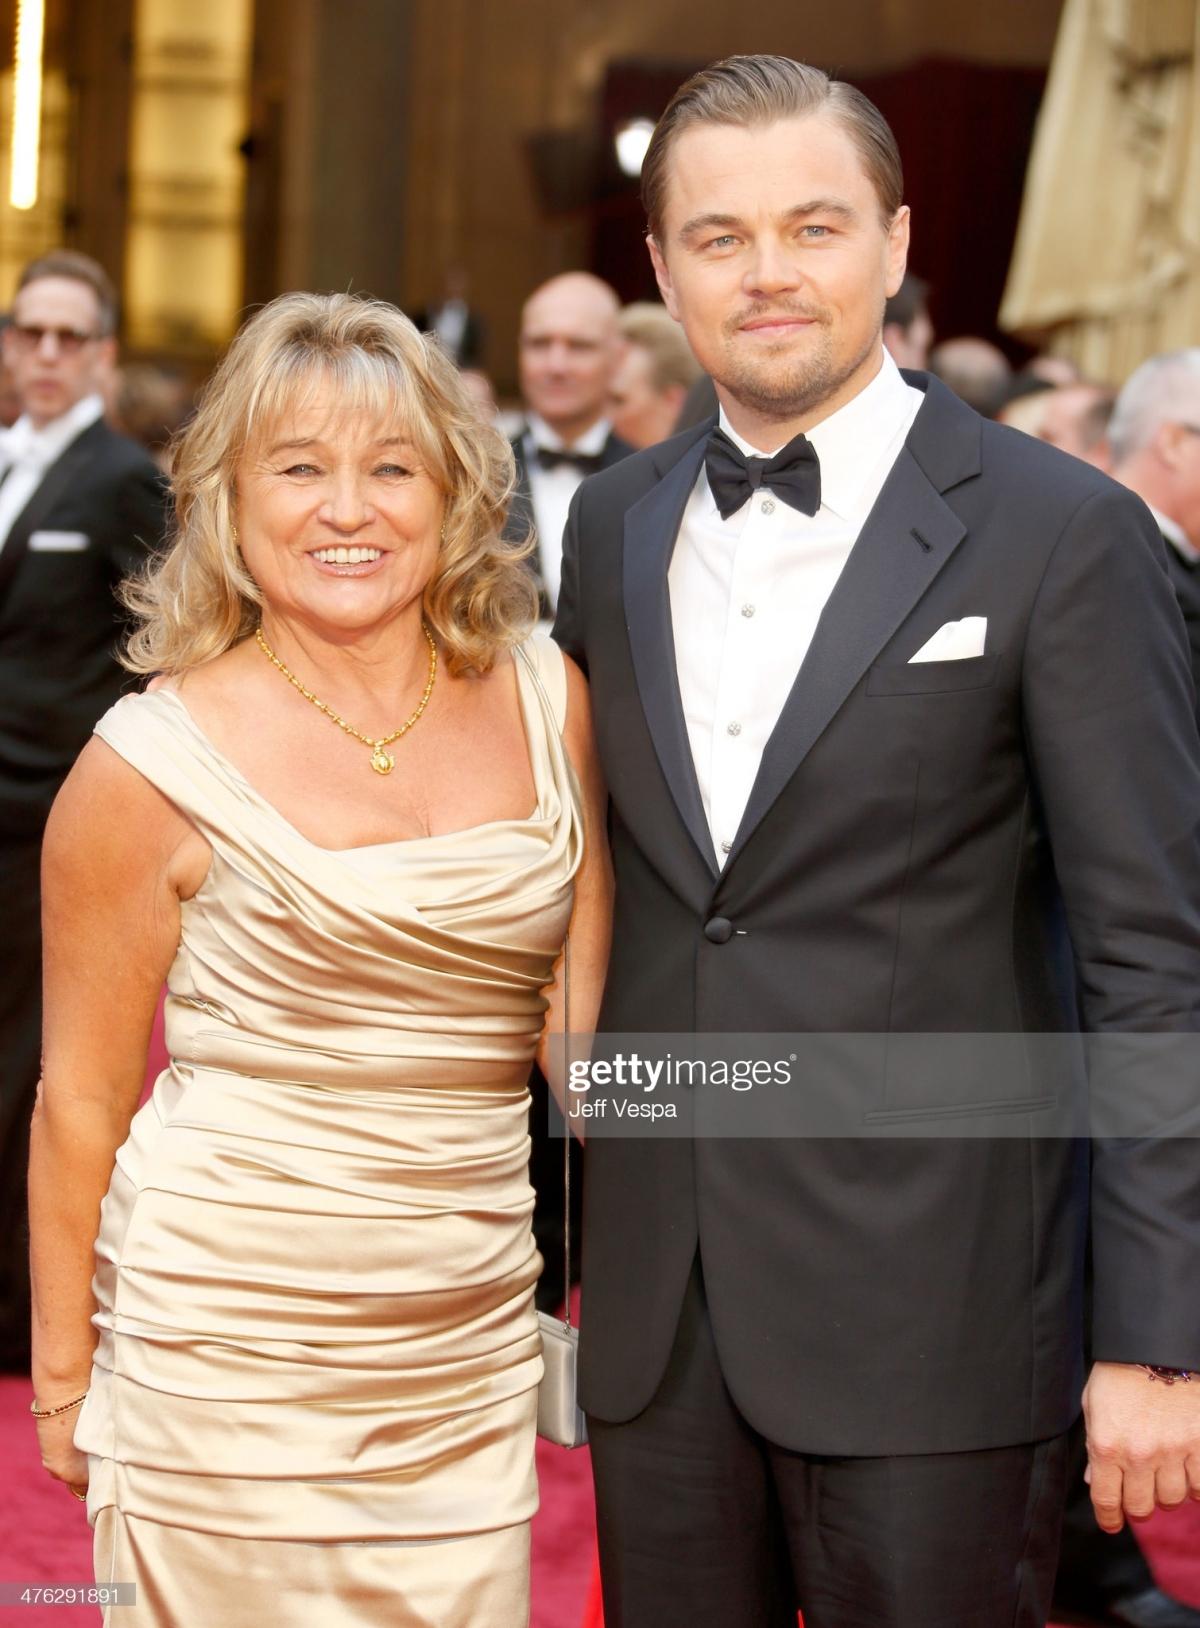 Leonardo DiCaprio và mẹ - bà Irmelin Indenbirken tại lễ trao giải Oscar năm 2014./.